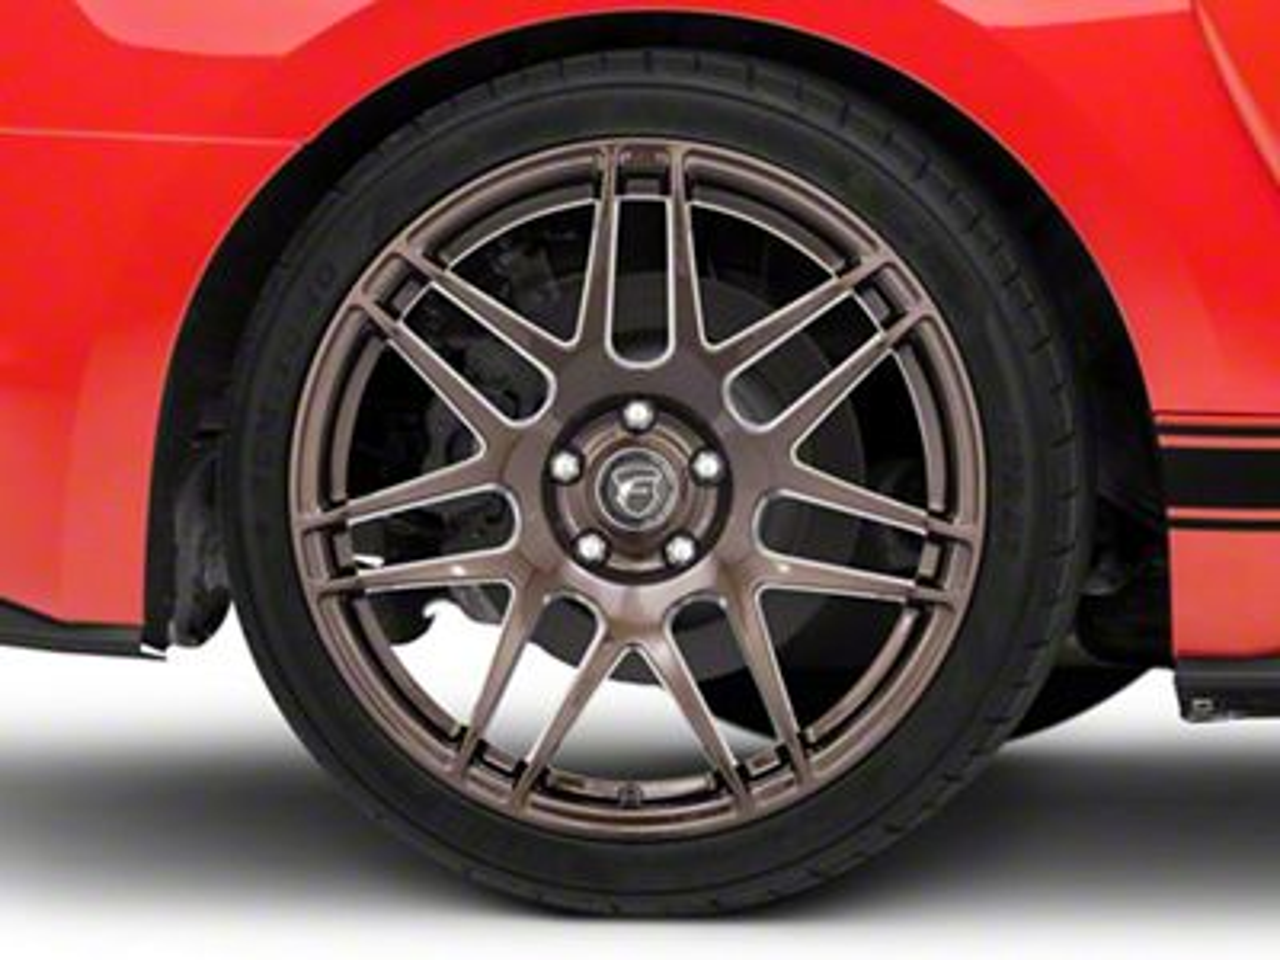 Forgestar F14 Monoblock Bronze Burst Wheel - 19x11 - Rear Only (15-19 GT, EcoBoost, V6)